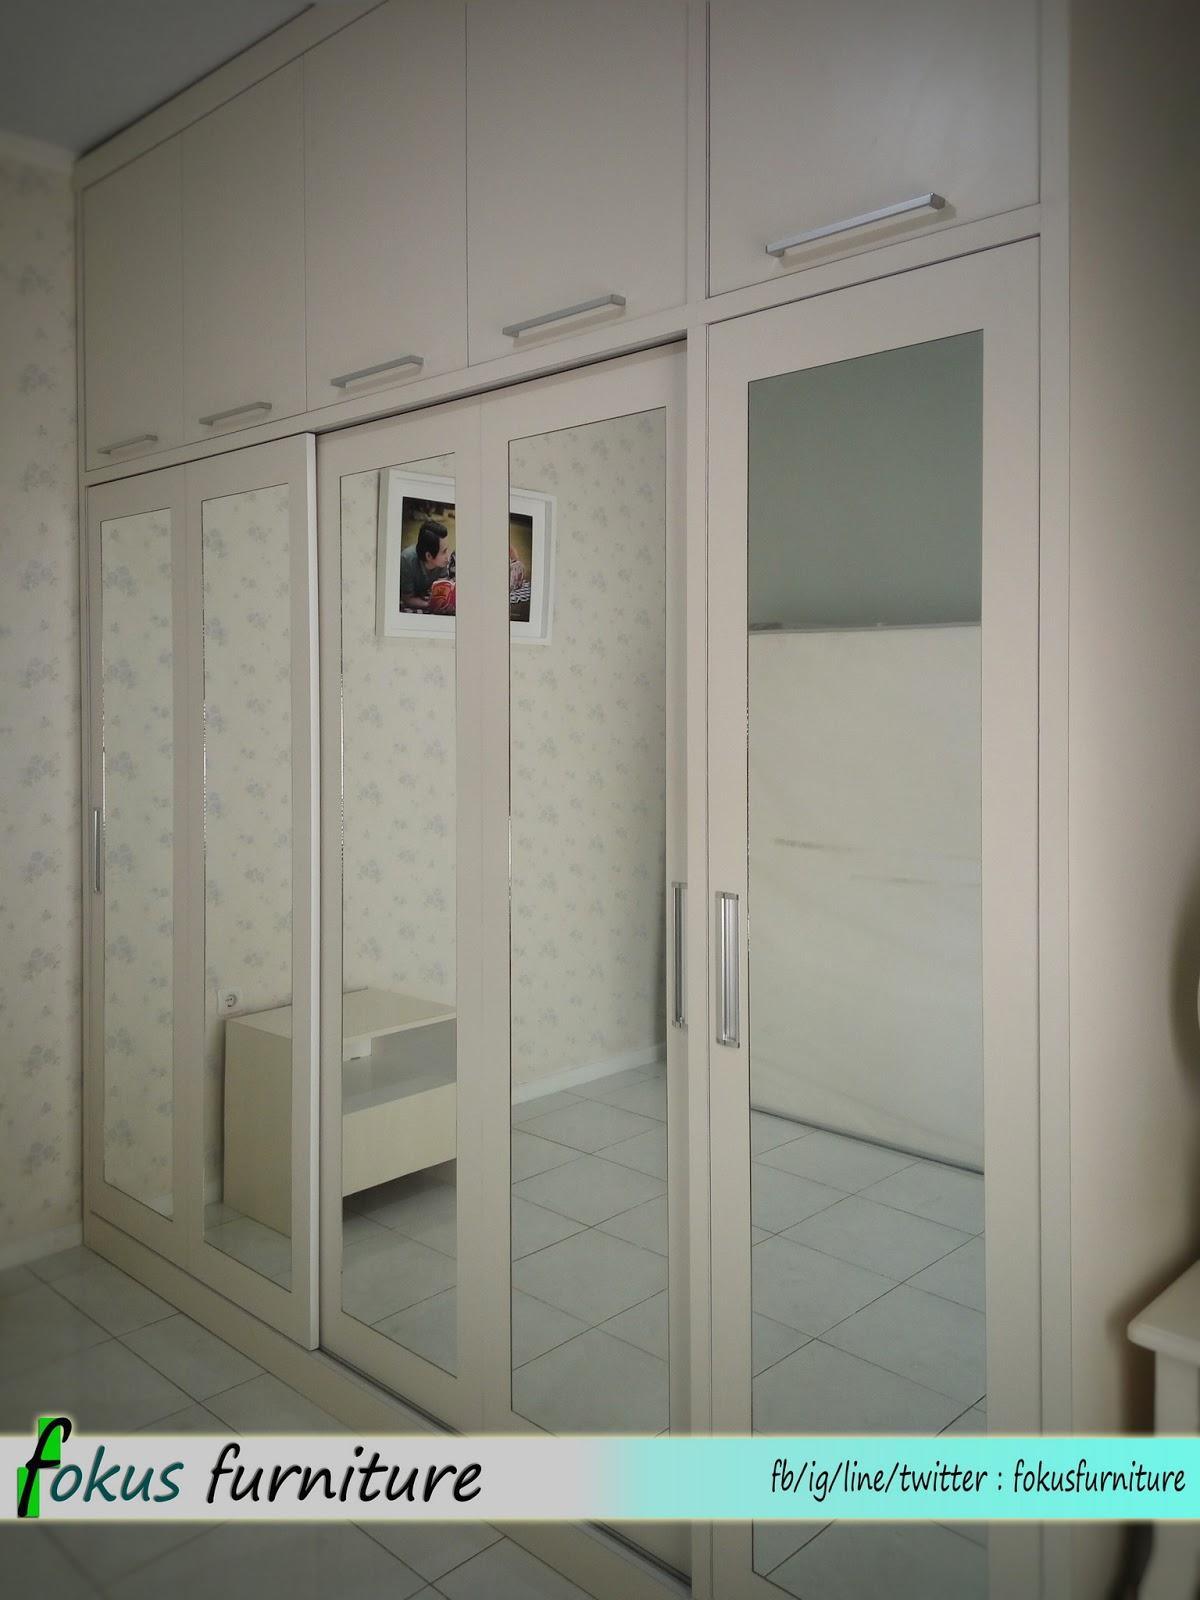 Lemari Pakaian Sliding Susun Di Citra Indah Cileungsi FurnitureKitchen Set Minimalislemari